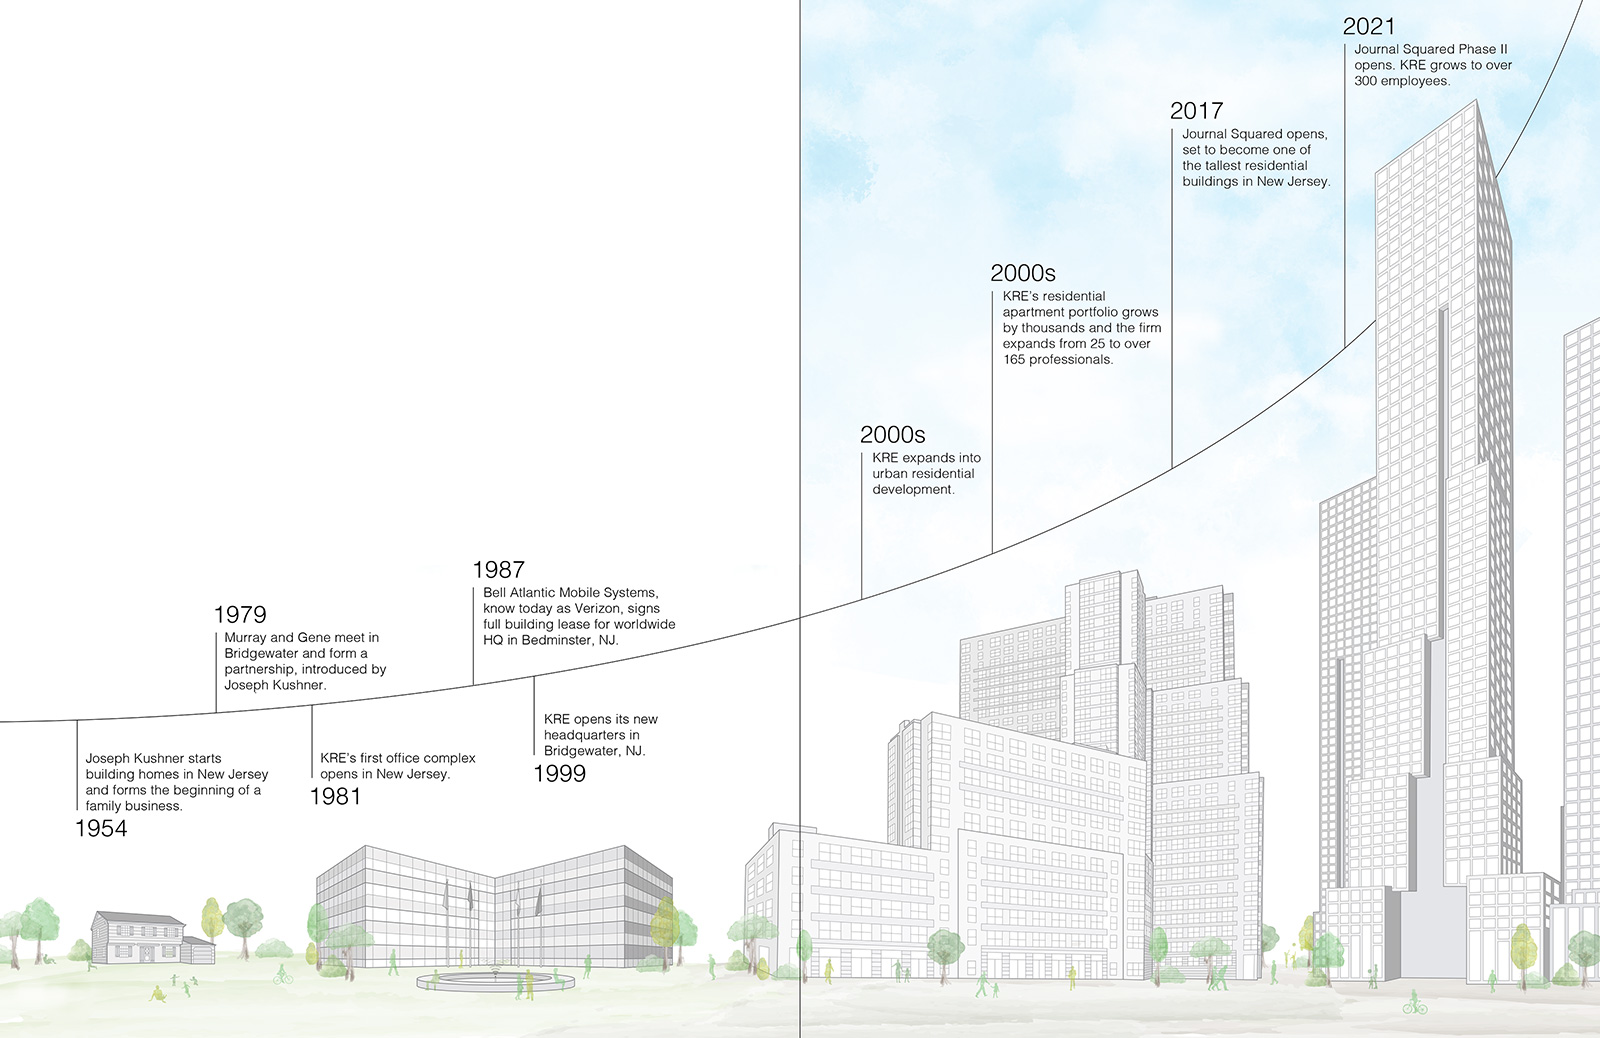 The KRE Group Timeline